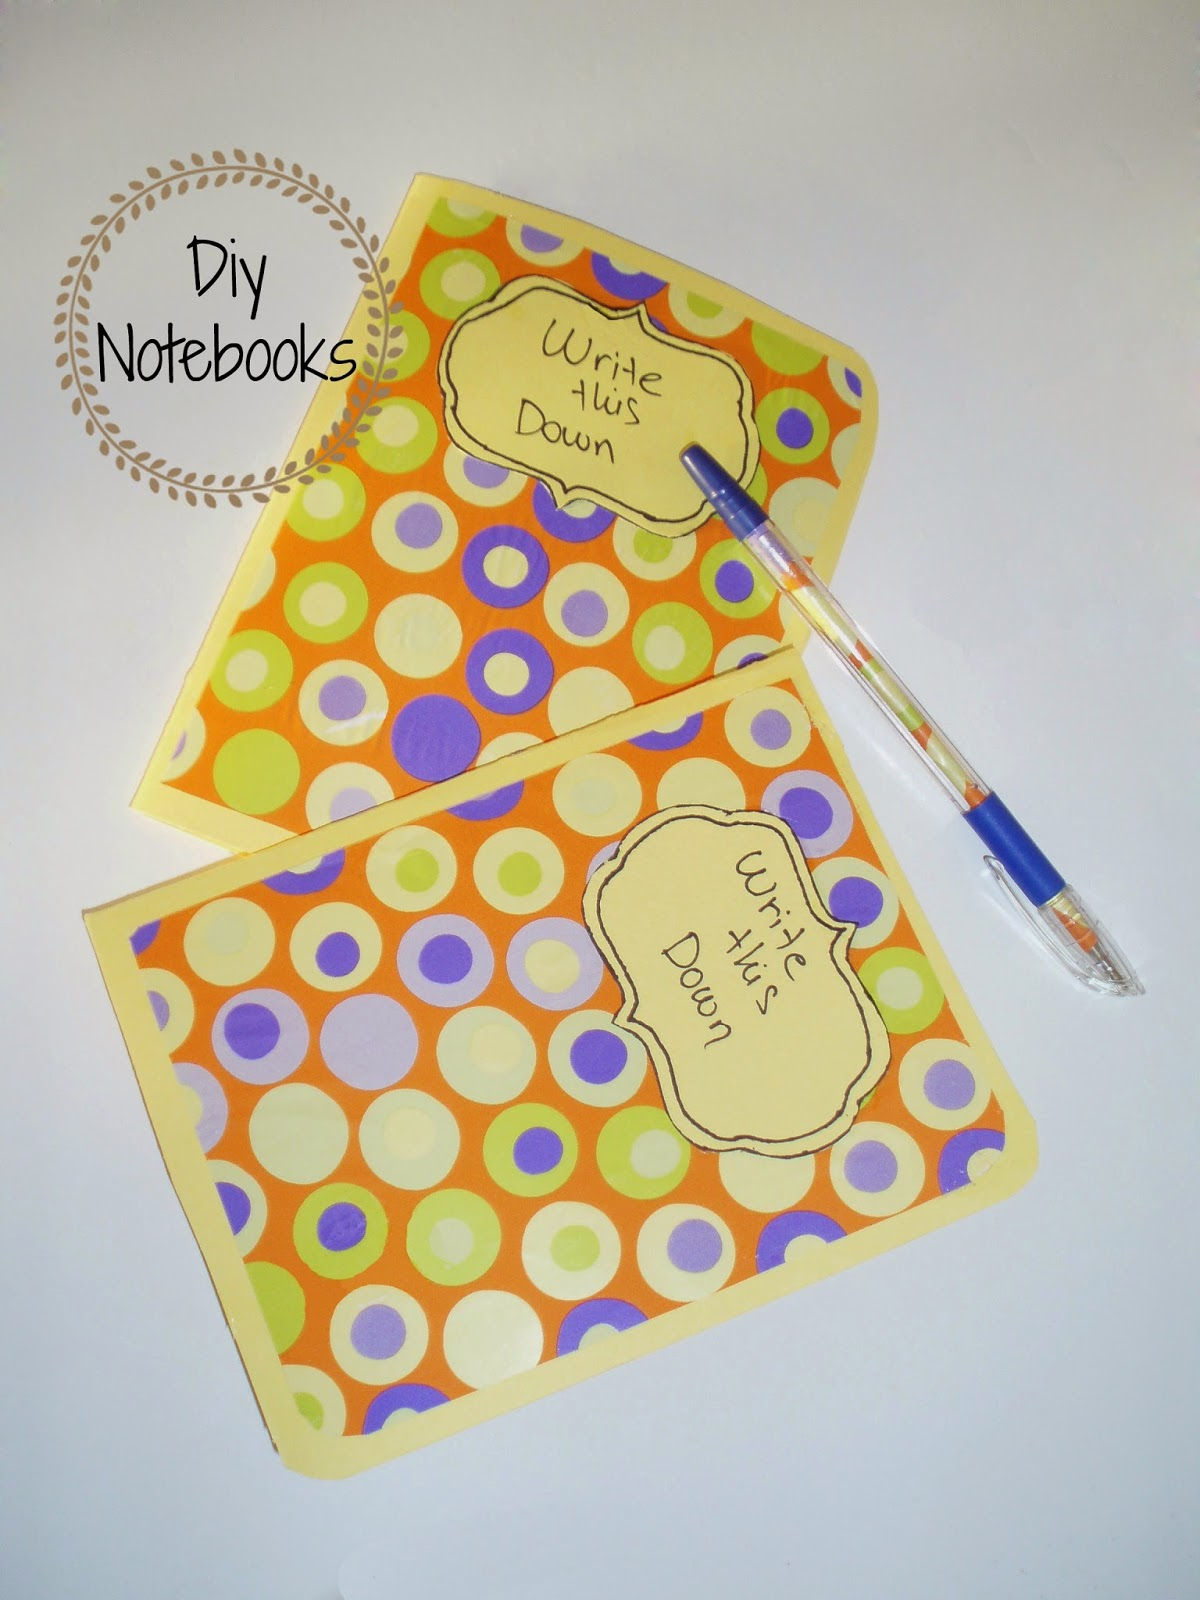 diy notebooks χειροποιητα σημειωματαρια